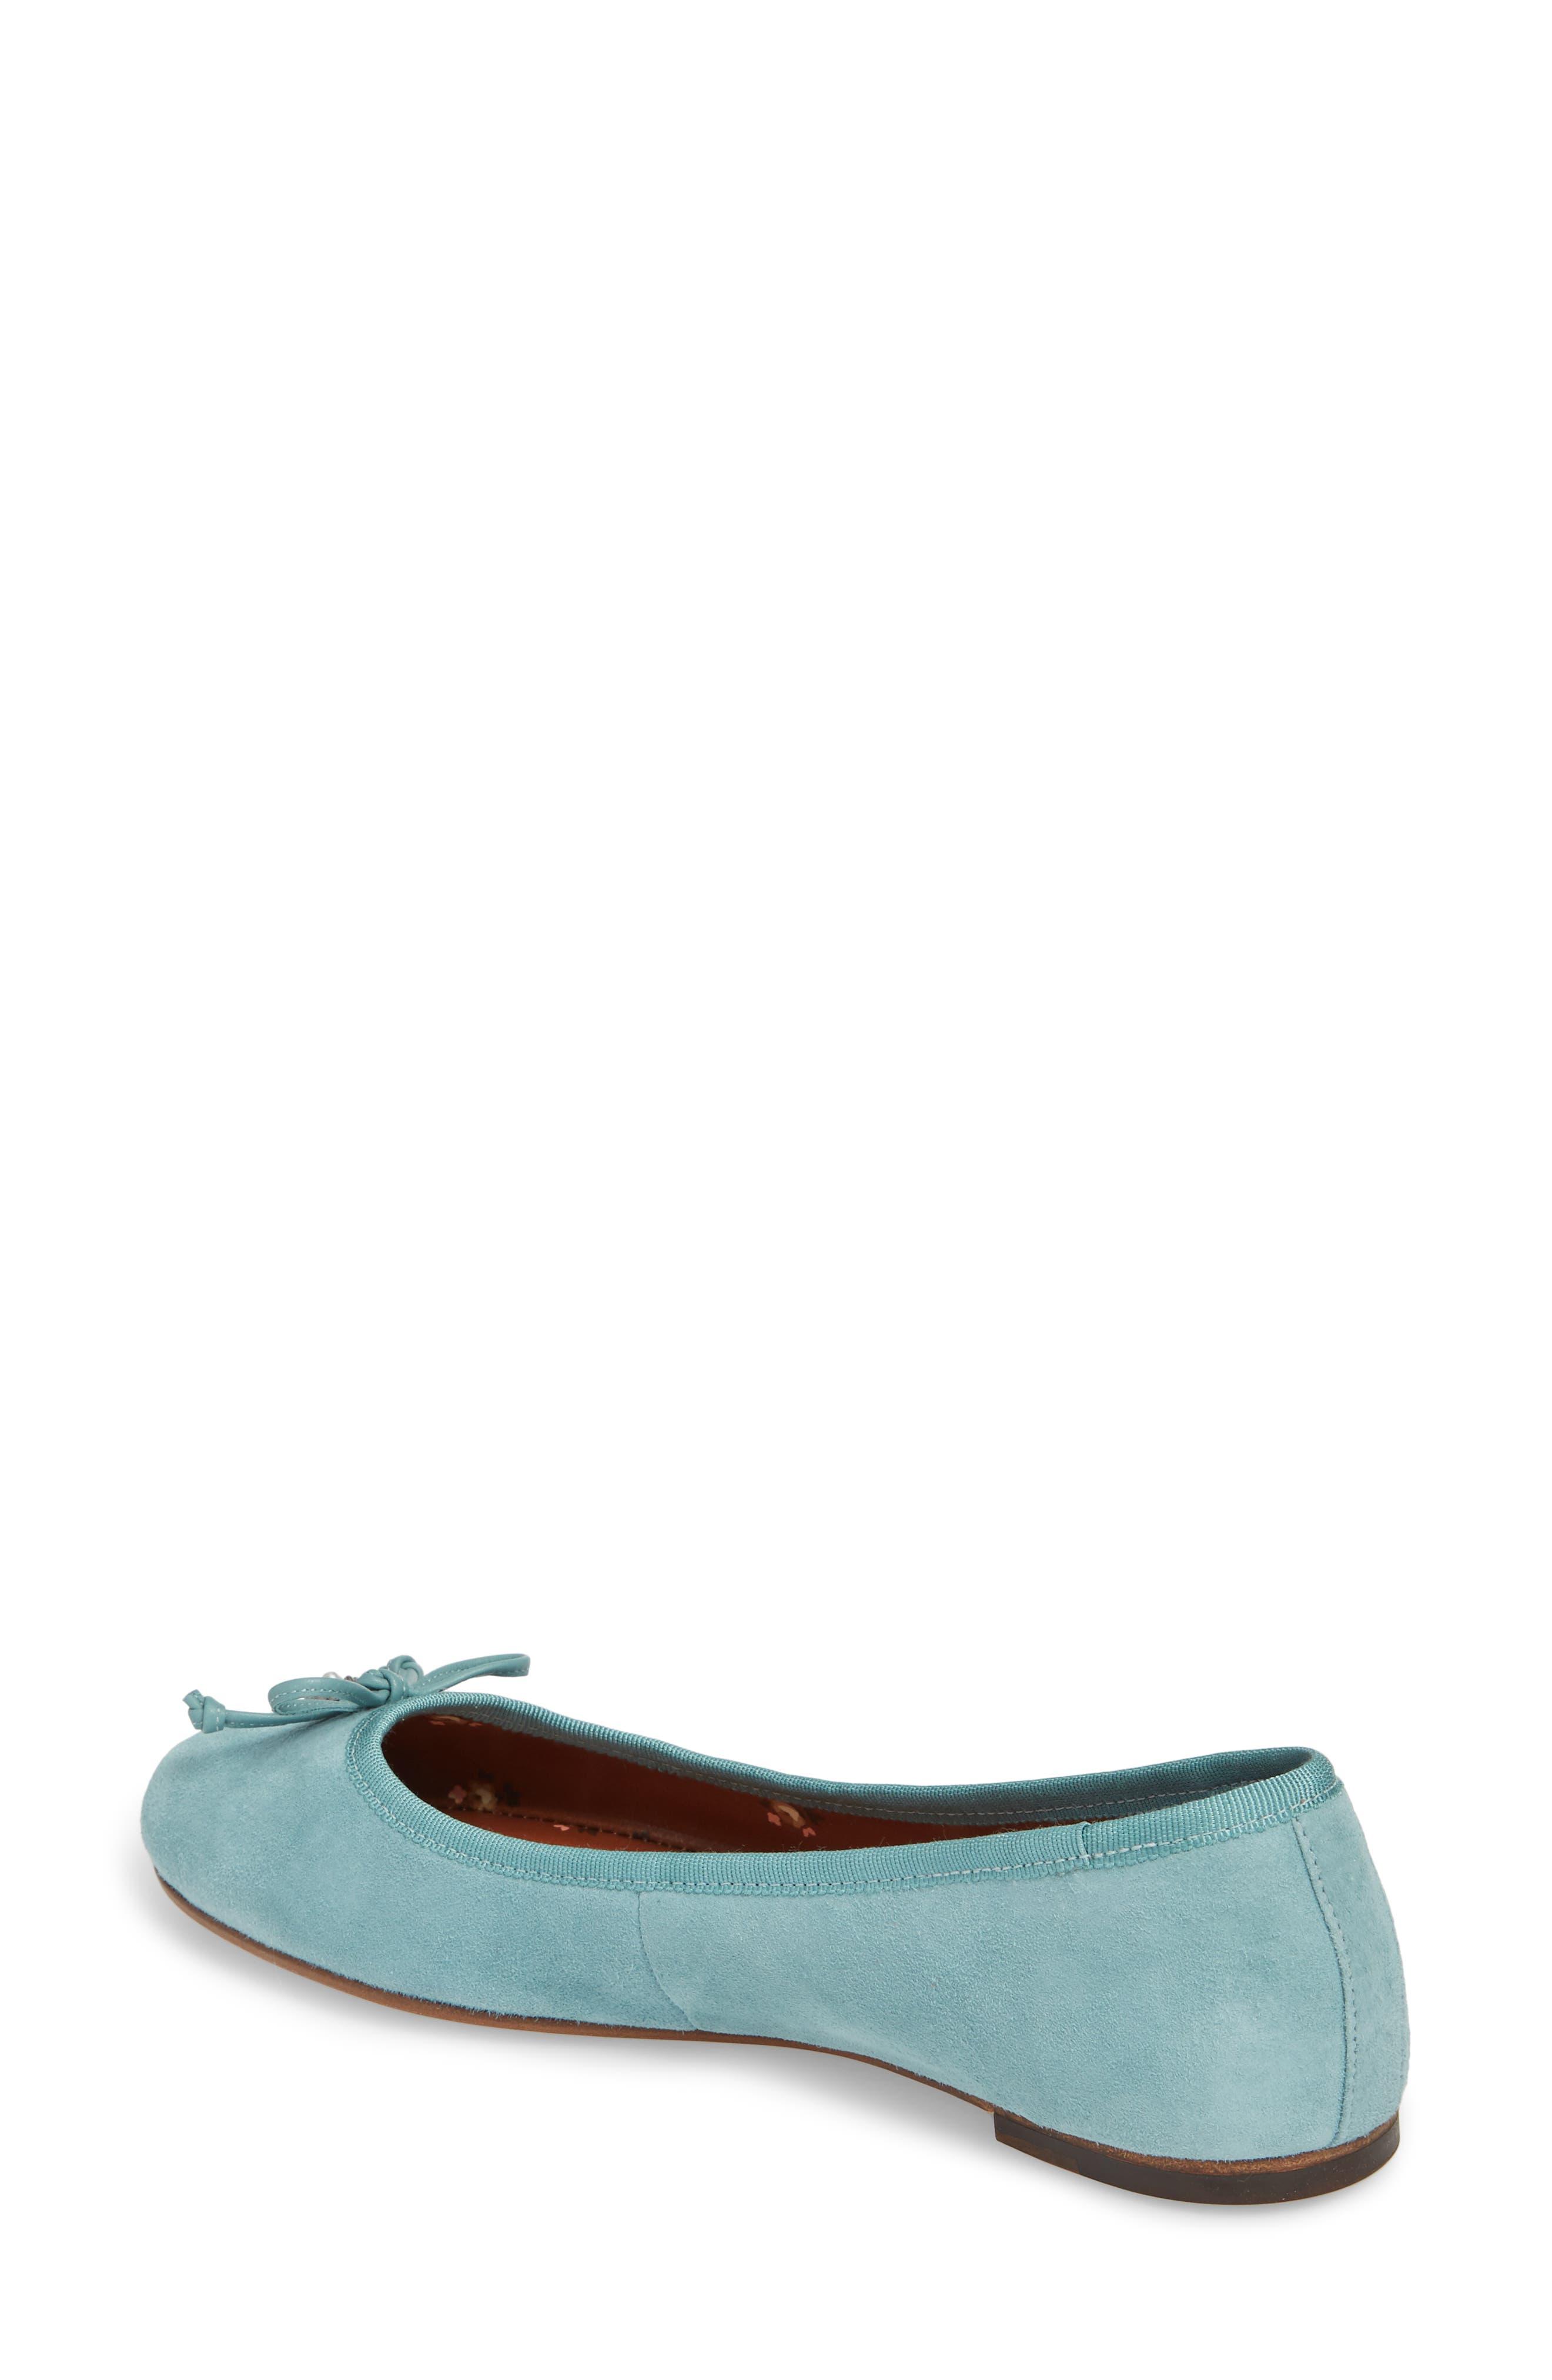 Lola Ballet Flat,                             Alternate thumbnail 2, color,                             Marine Leather